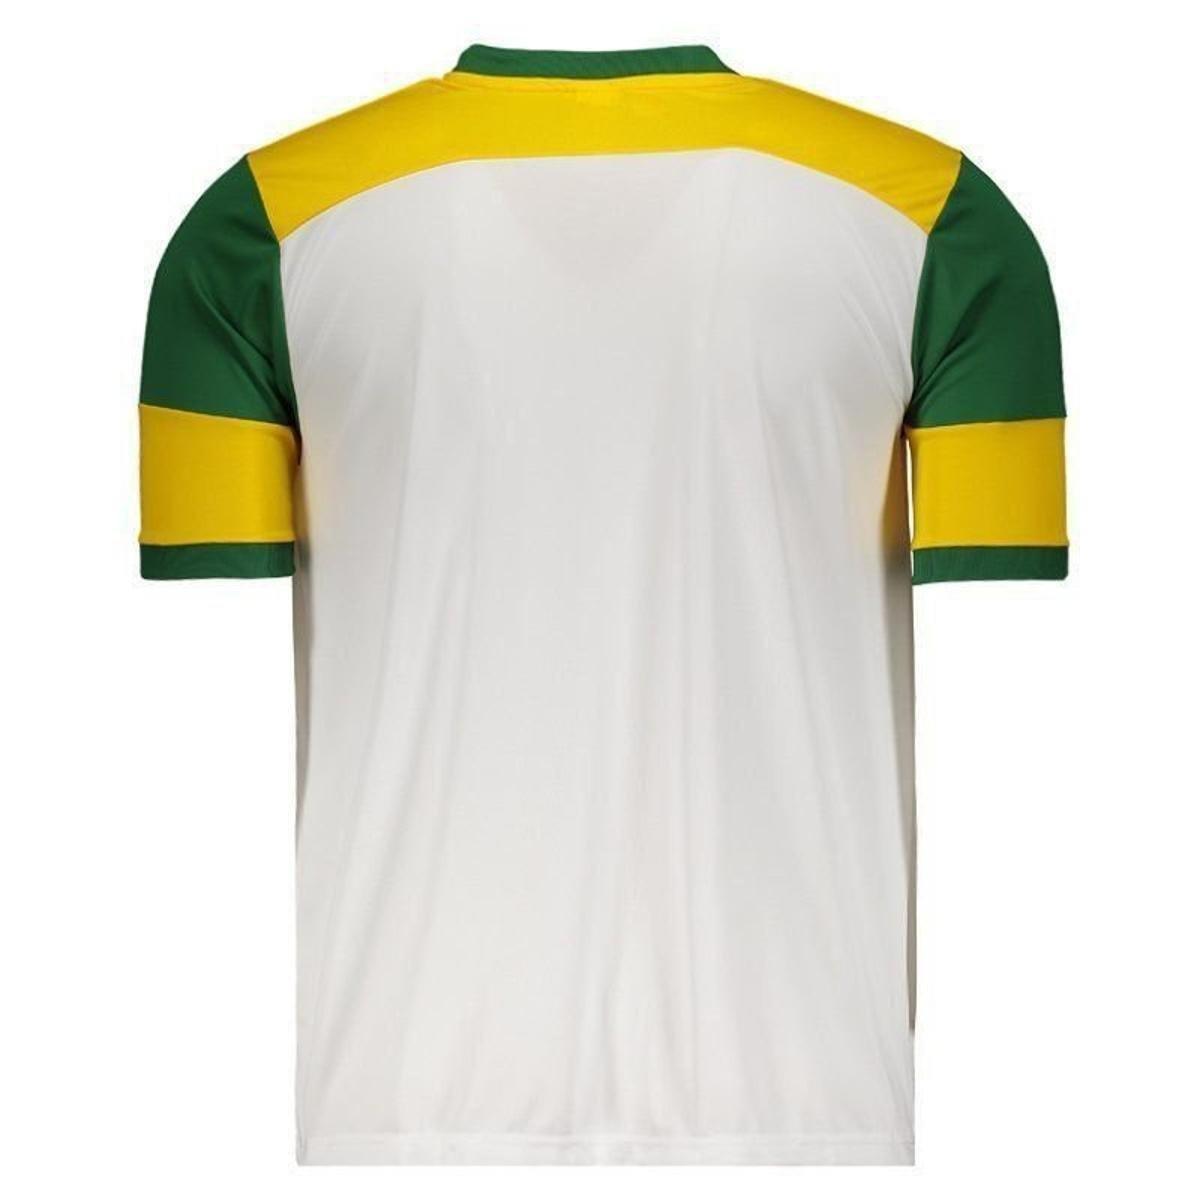 510674568a Camisa Flamengo Brasil Retrô Masculina - Branco - Compre Agora ...